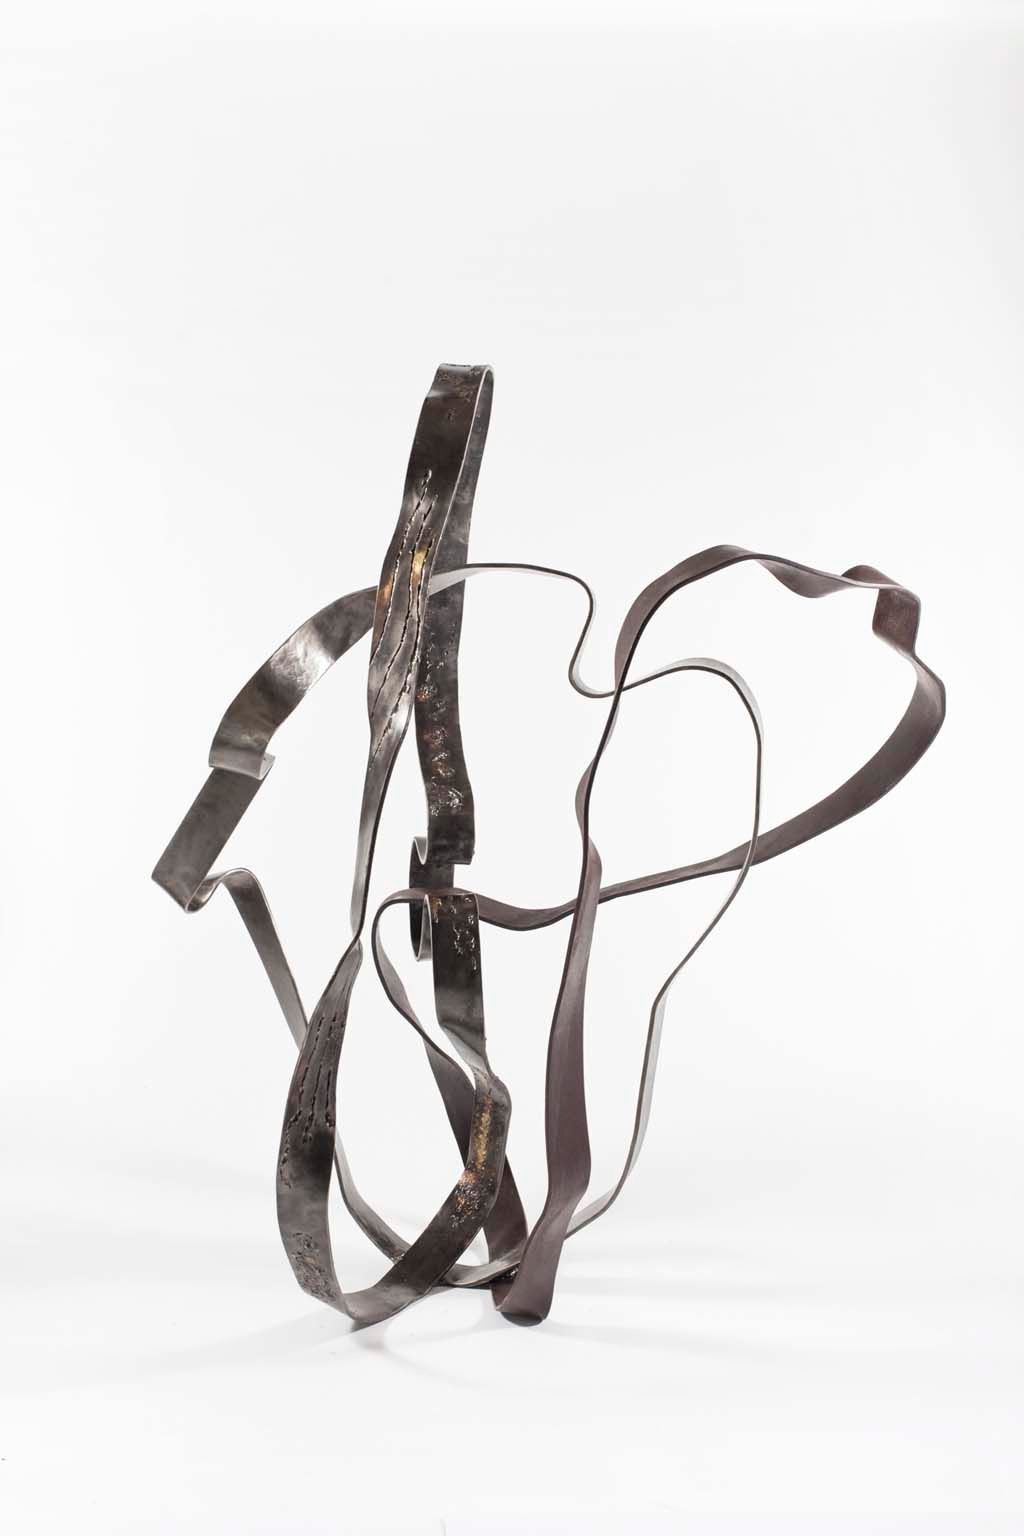 Oblivion IV | 2016 | 152x100x90 cm |  Iron & brass sculpture | Rami Ater | רמי אטר